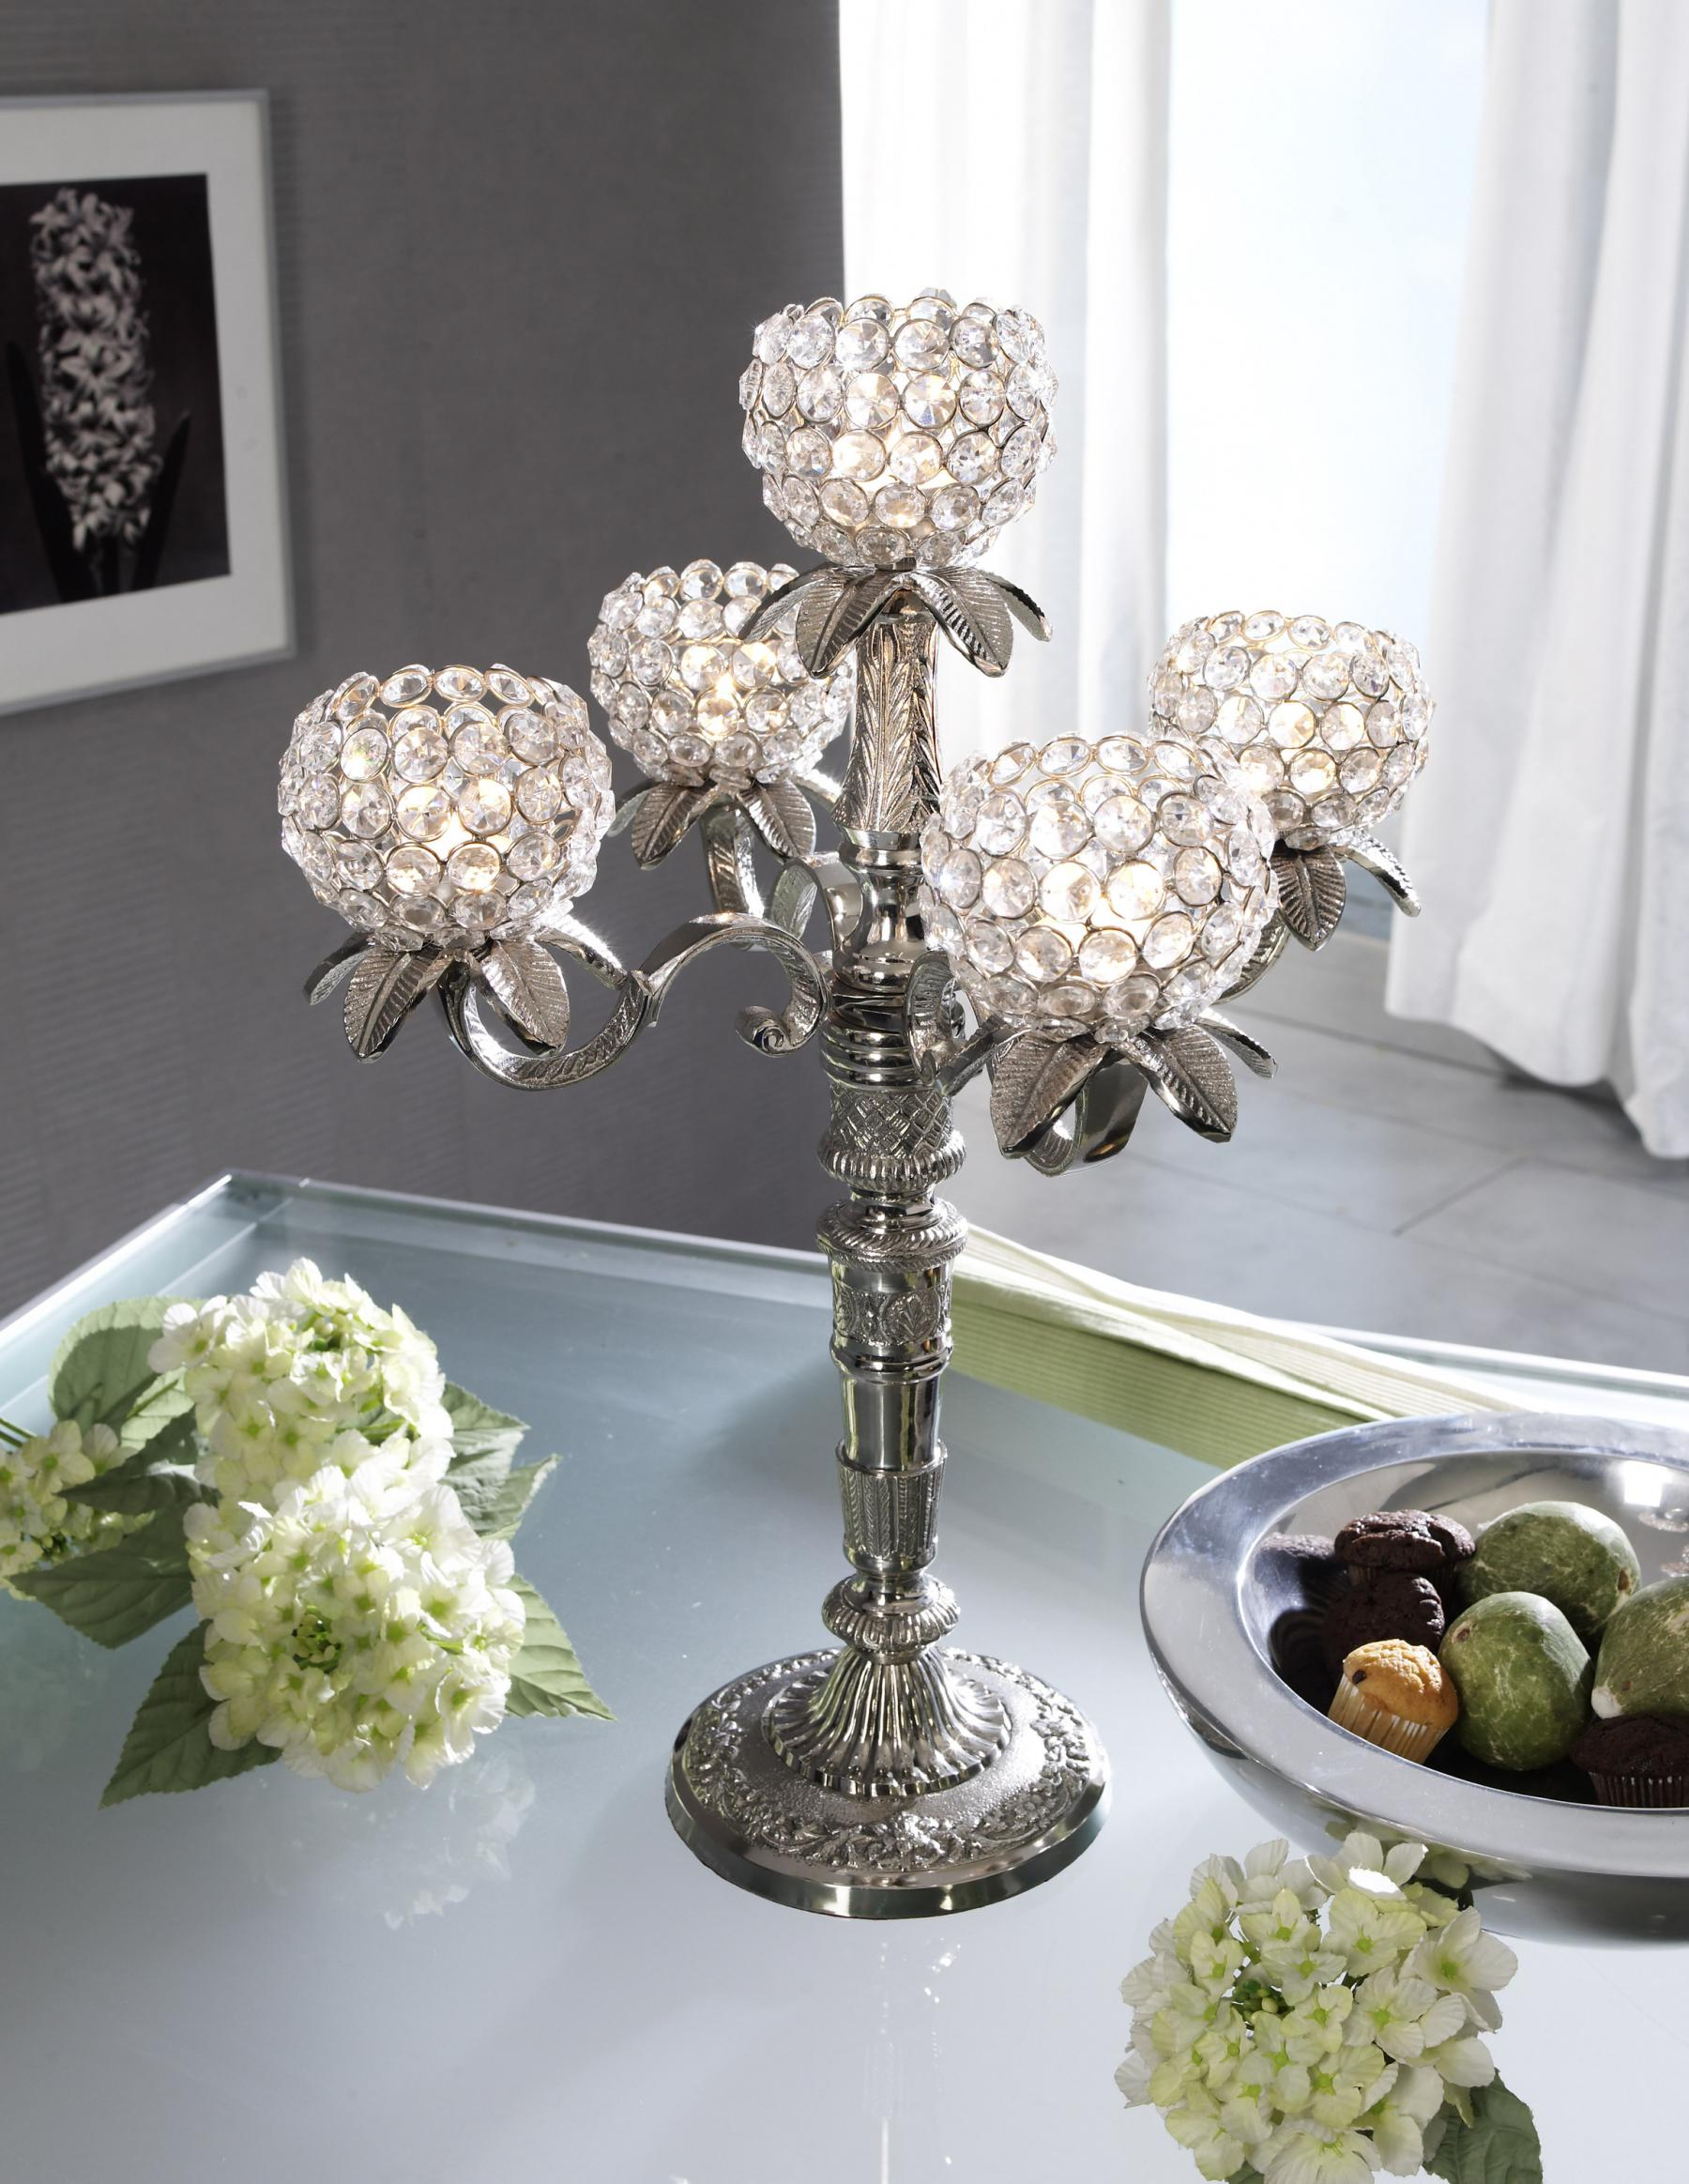 kristall kerzenst nder florence kerzenhalter 5 armig in silber leuchter silberleuchter aluminium. Black Bedroom Furniture Sets. Home Design Ideas